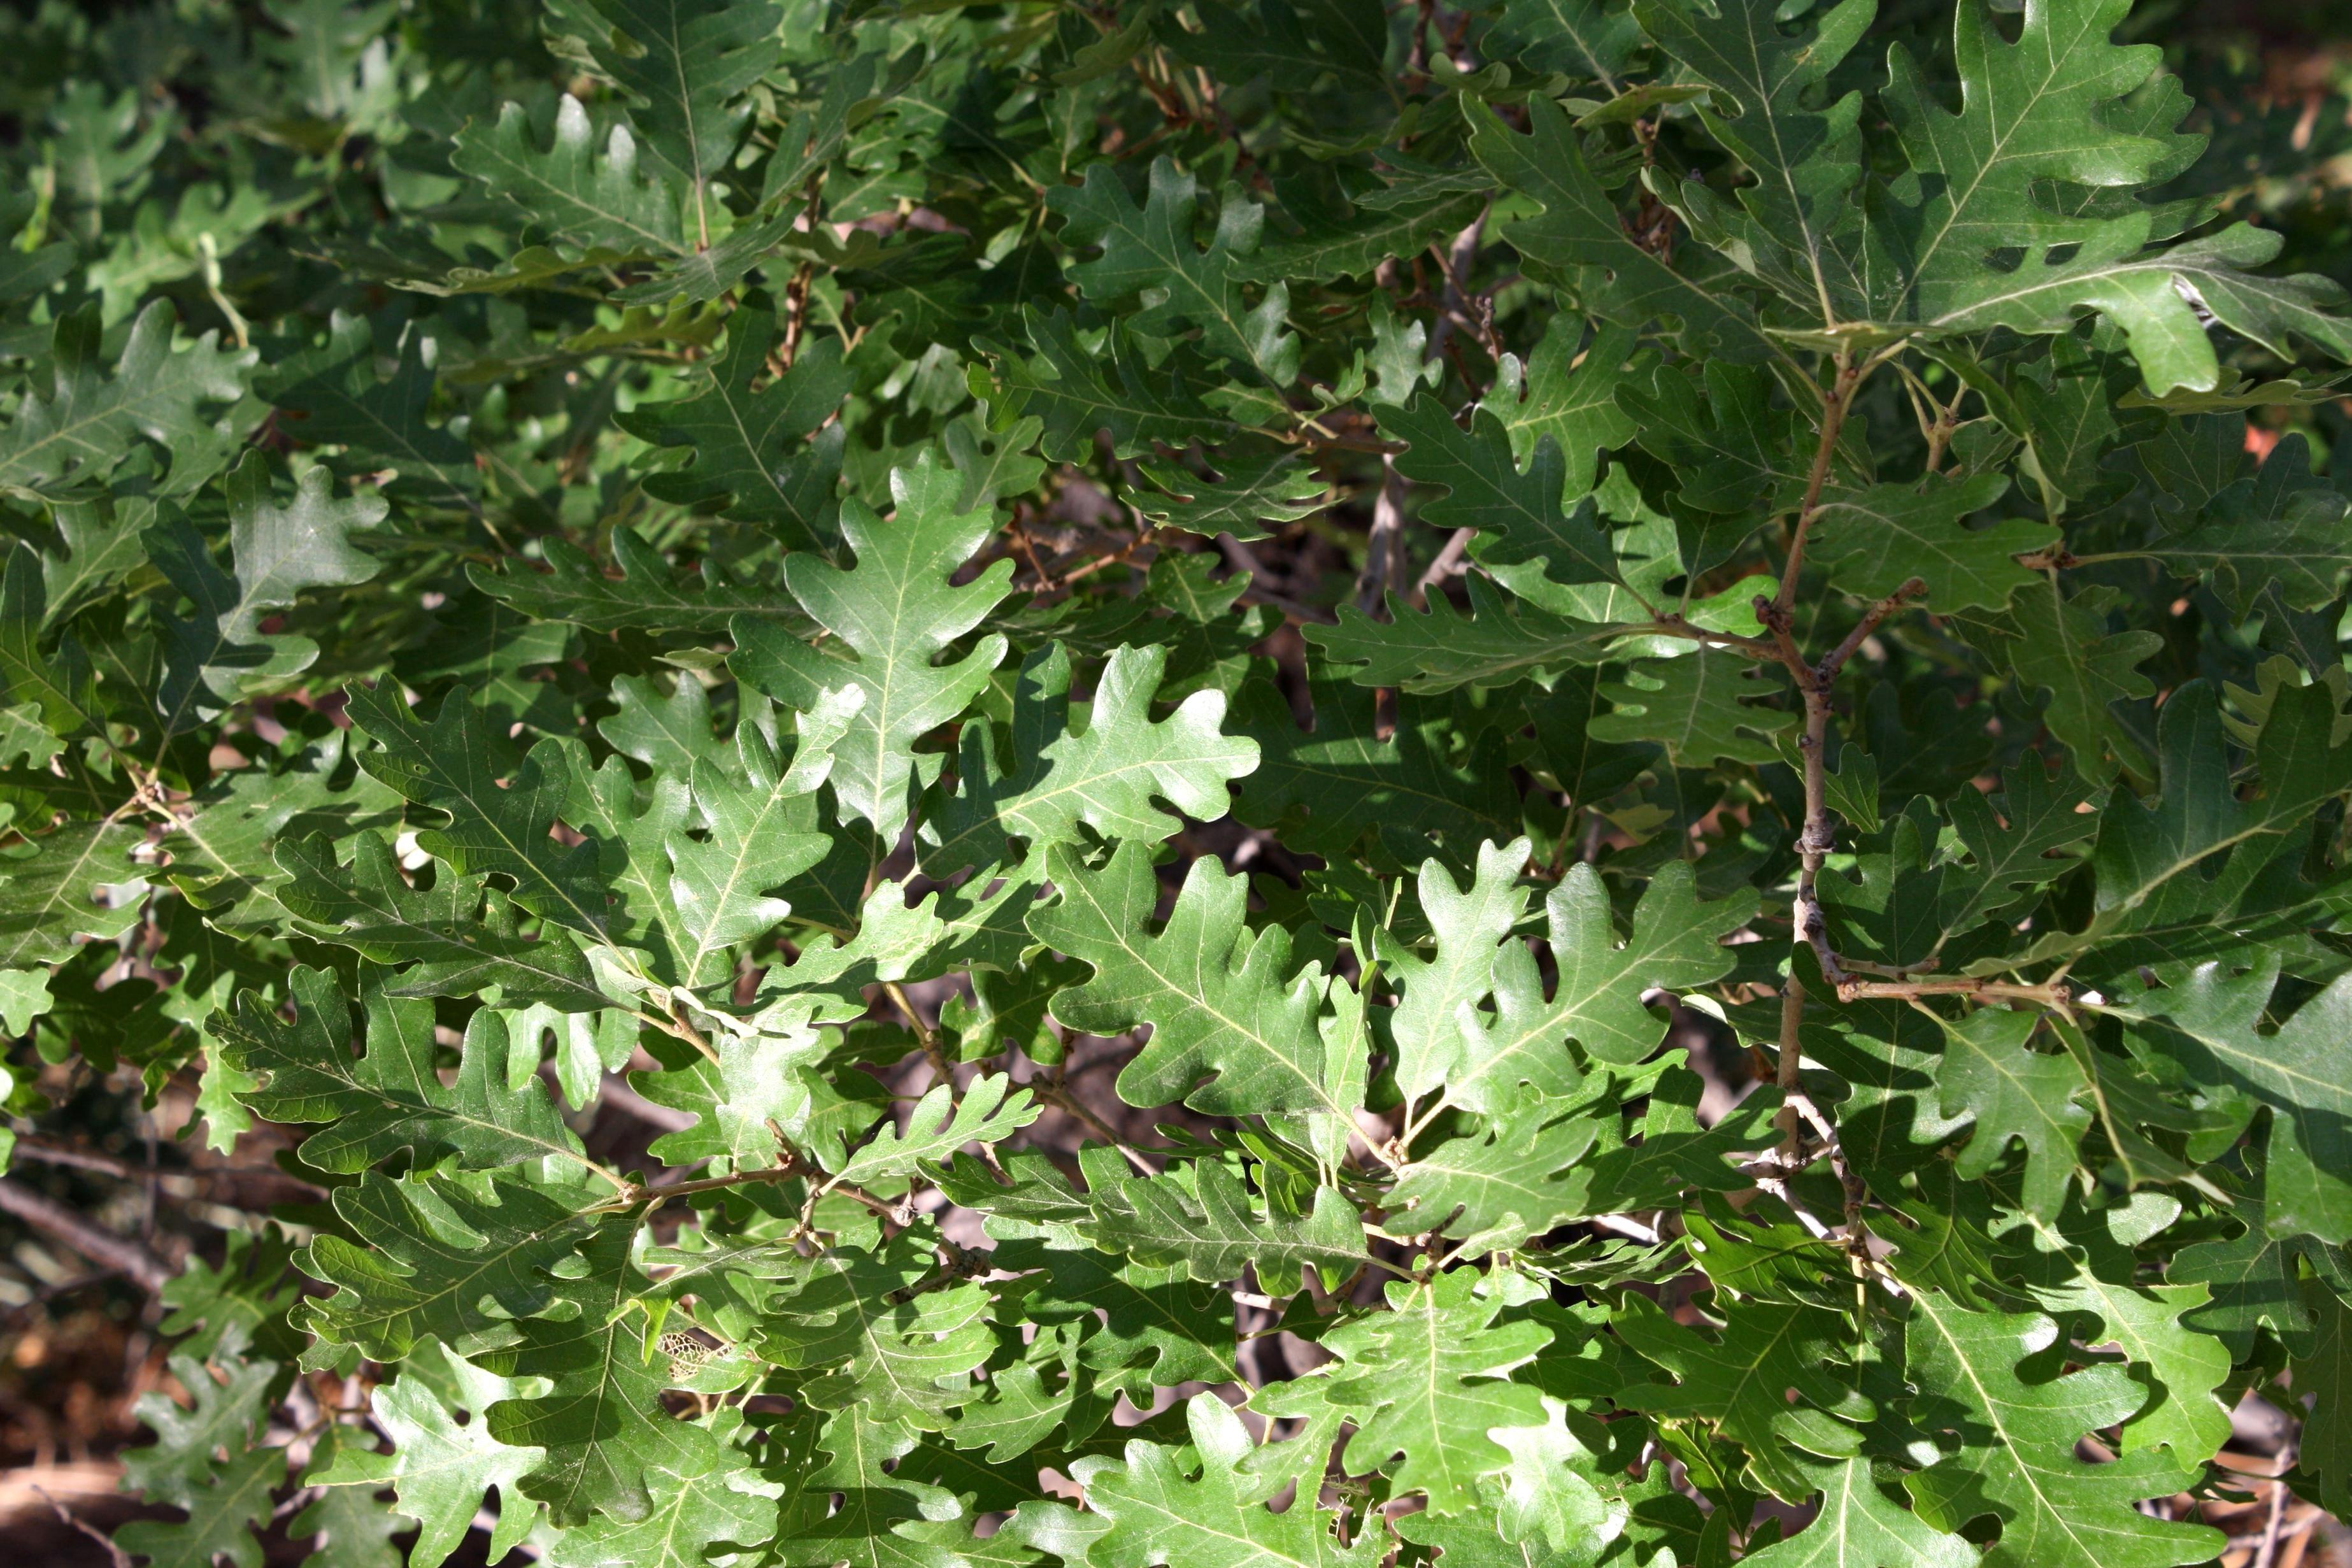 Foto gratis querce foglie di quercia albero for Quercia sempreverde